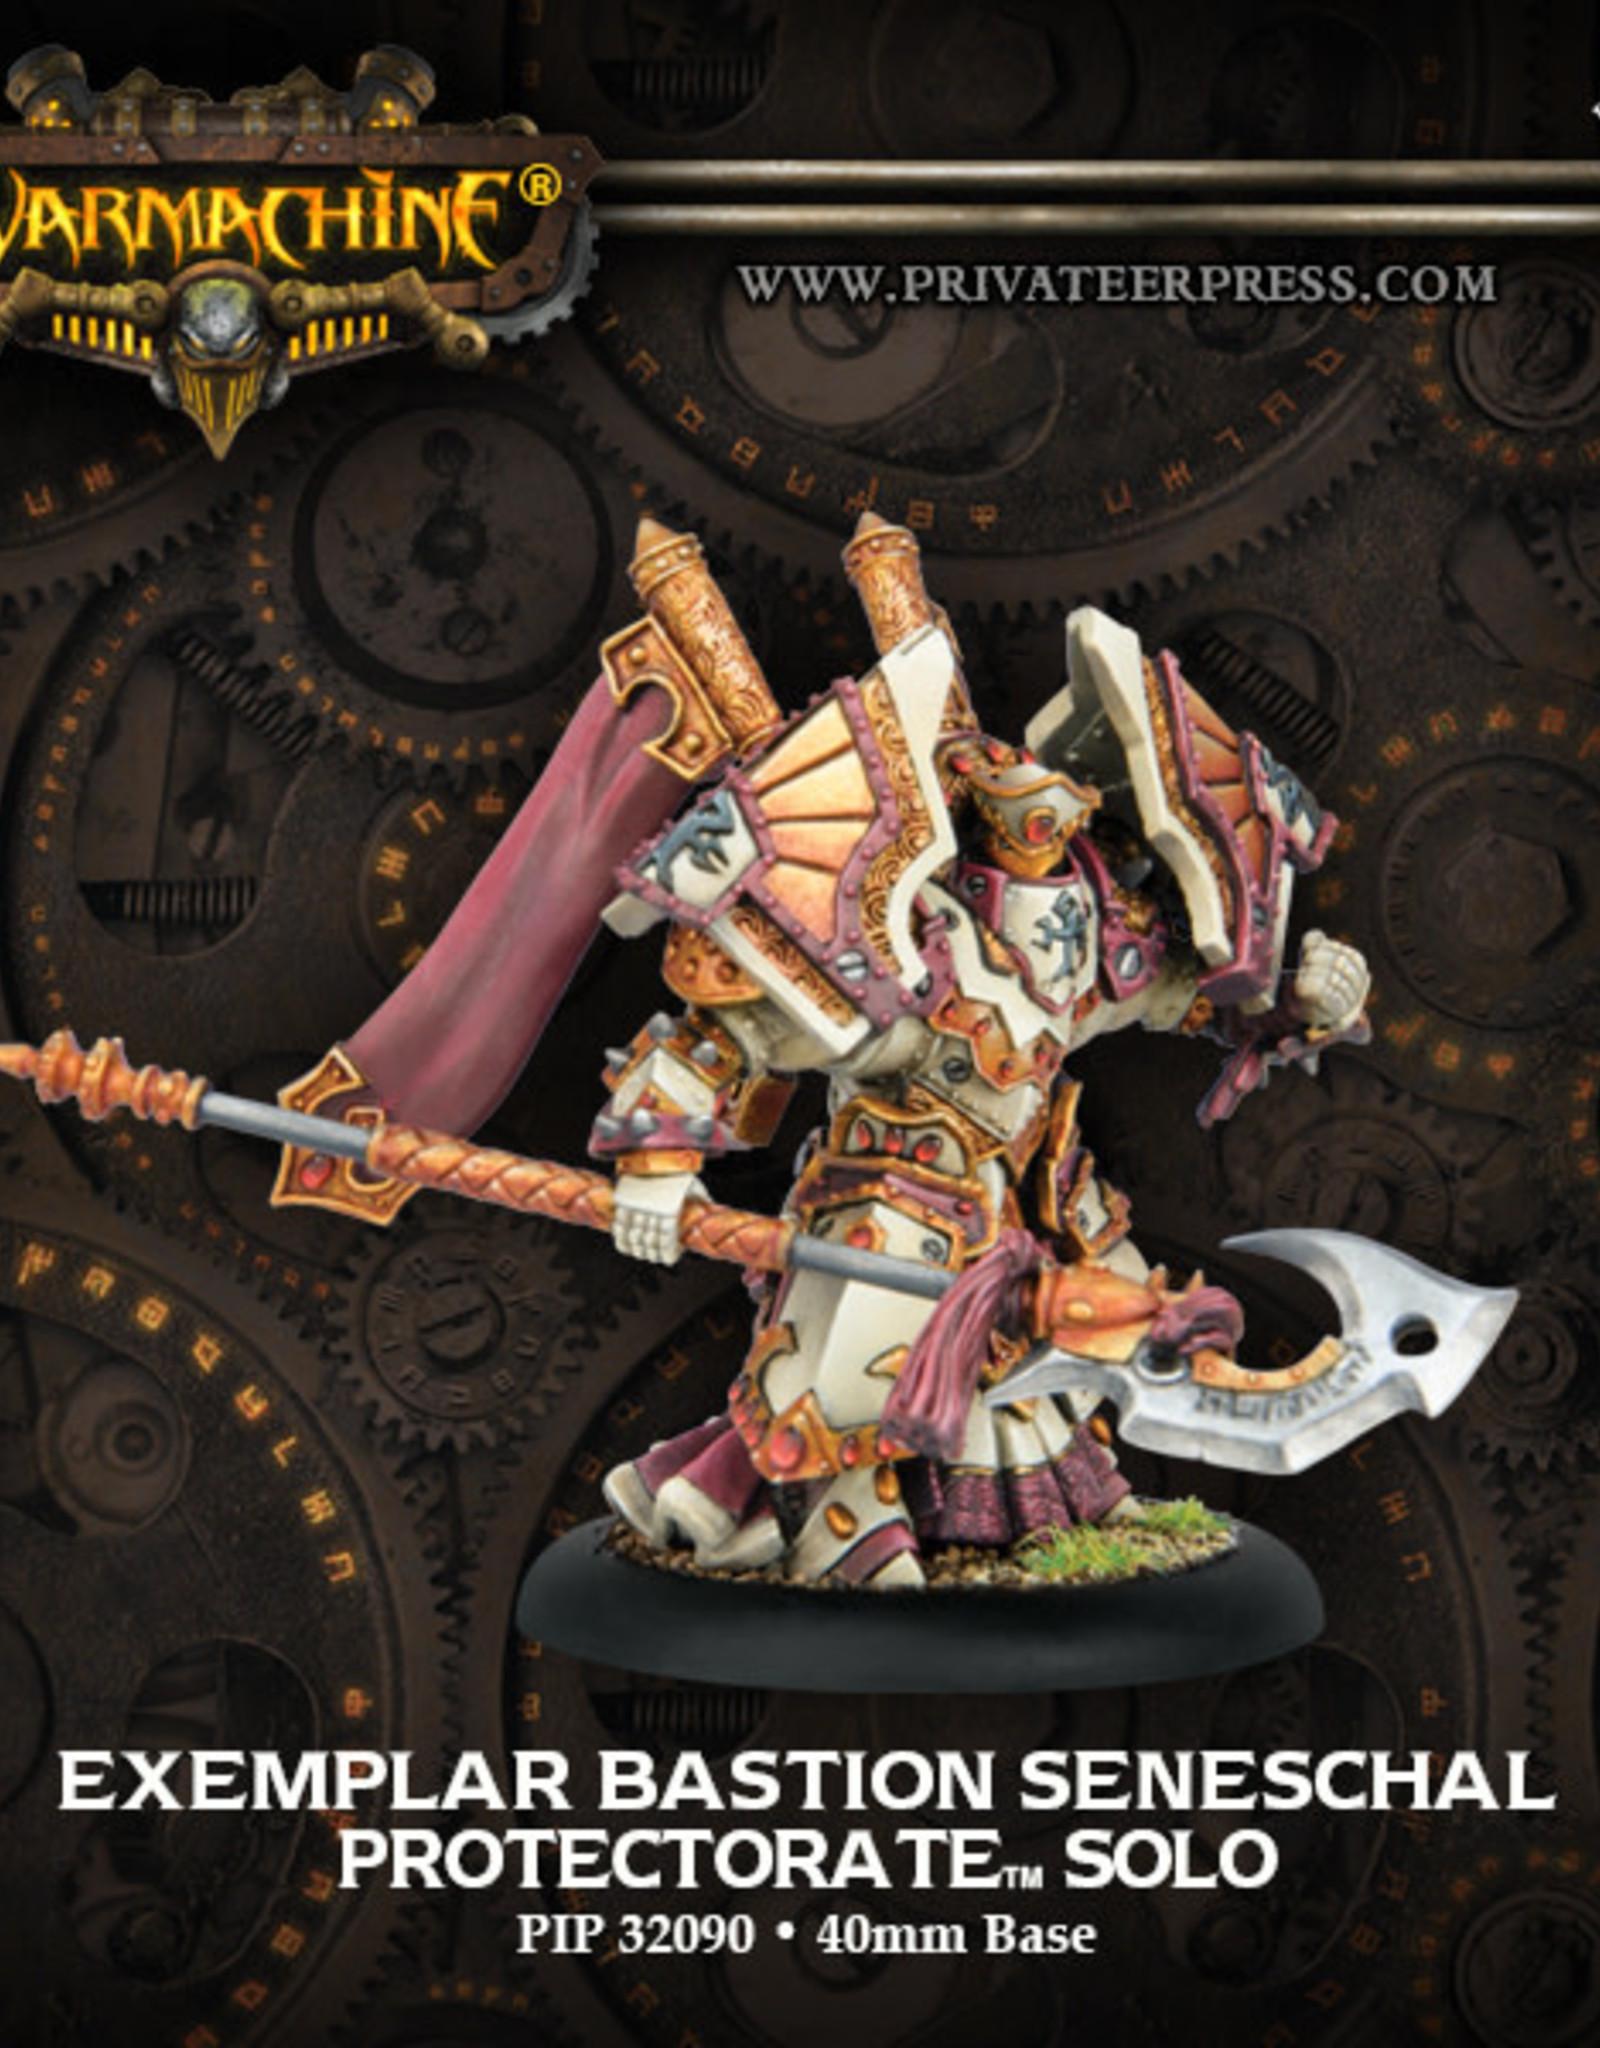 Warmachine Protectorate - Exemplar Bastion Seneschal